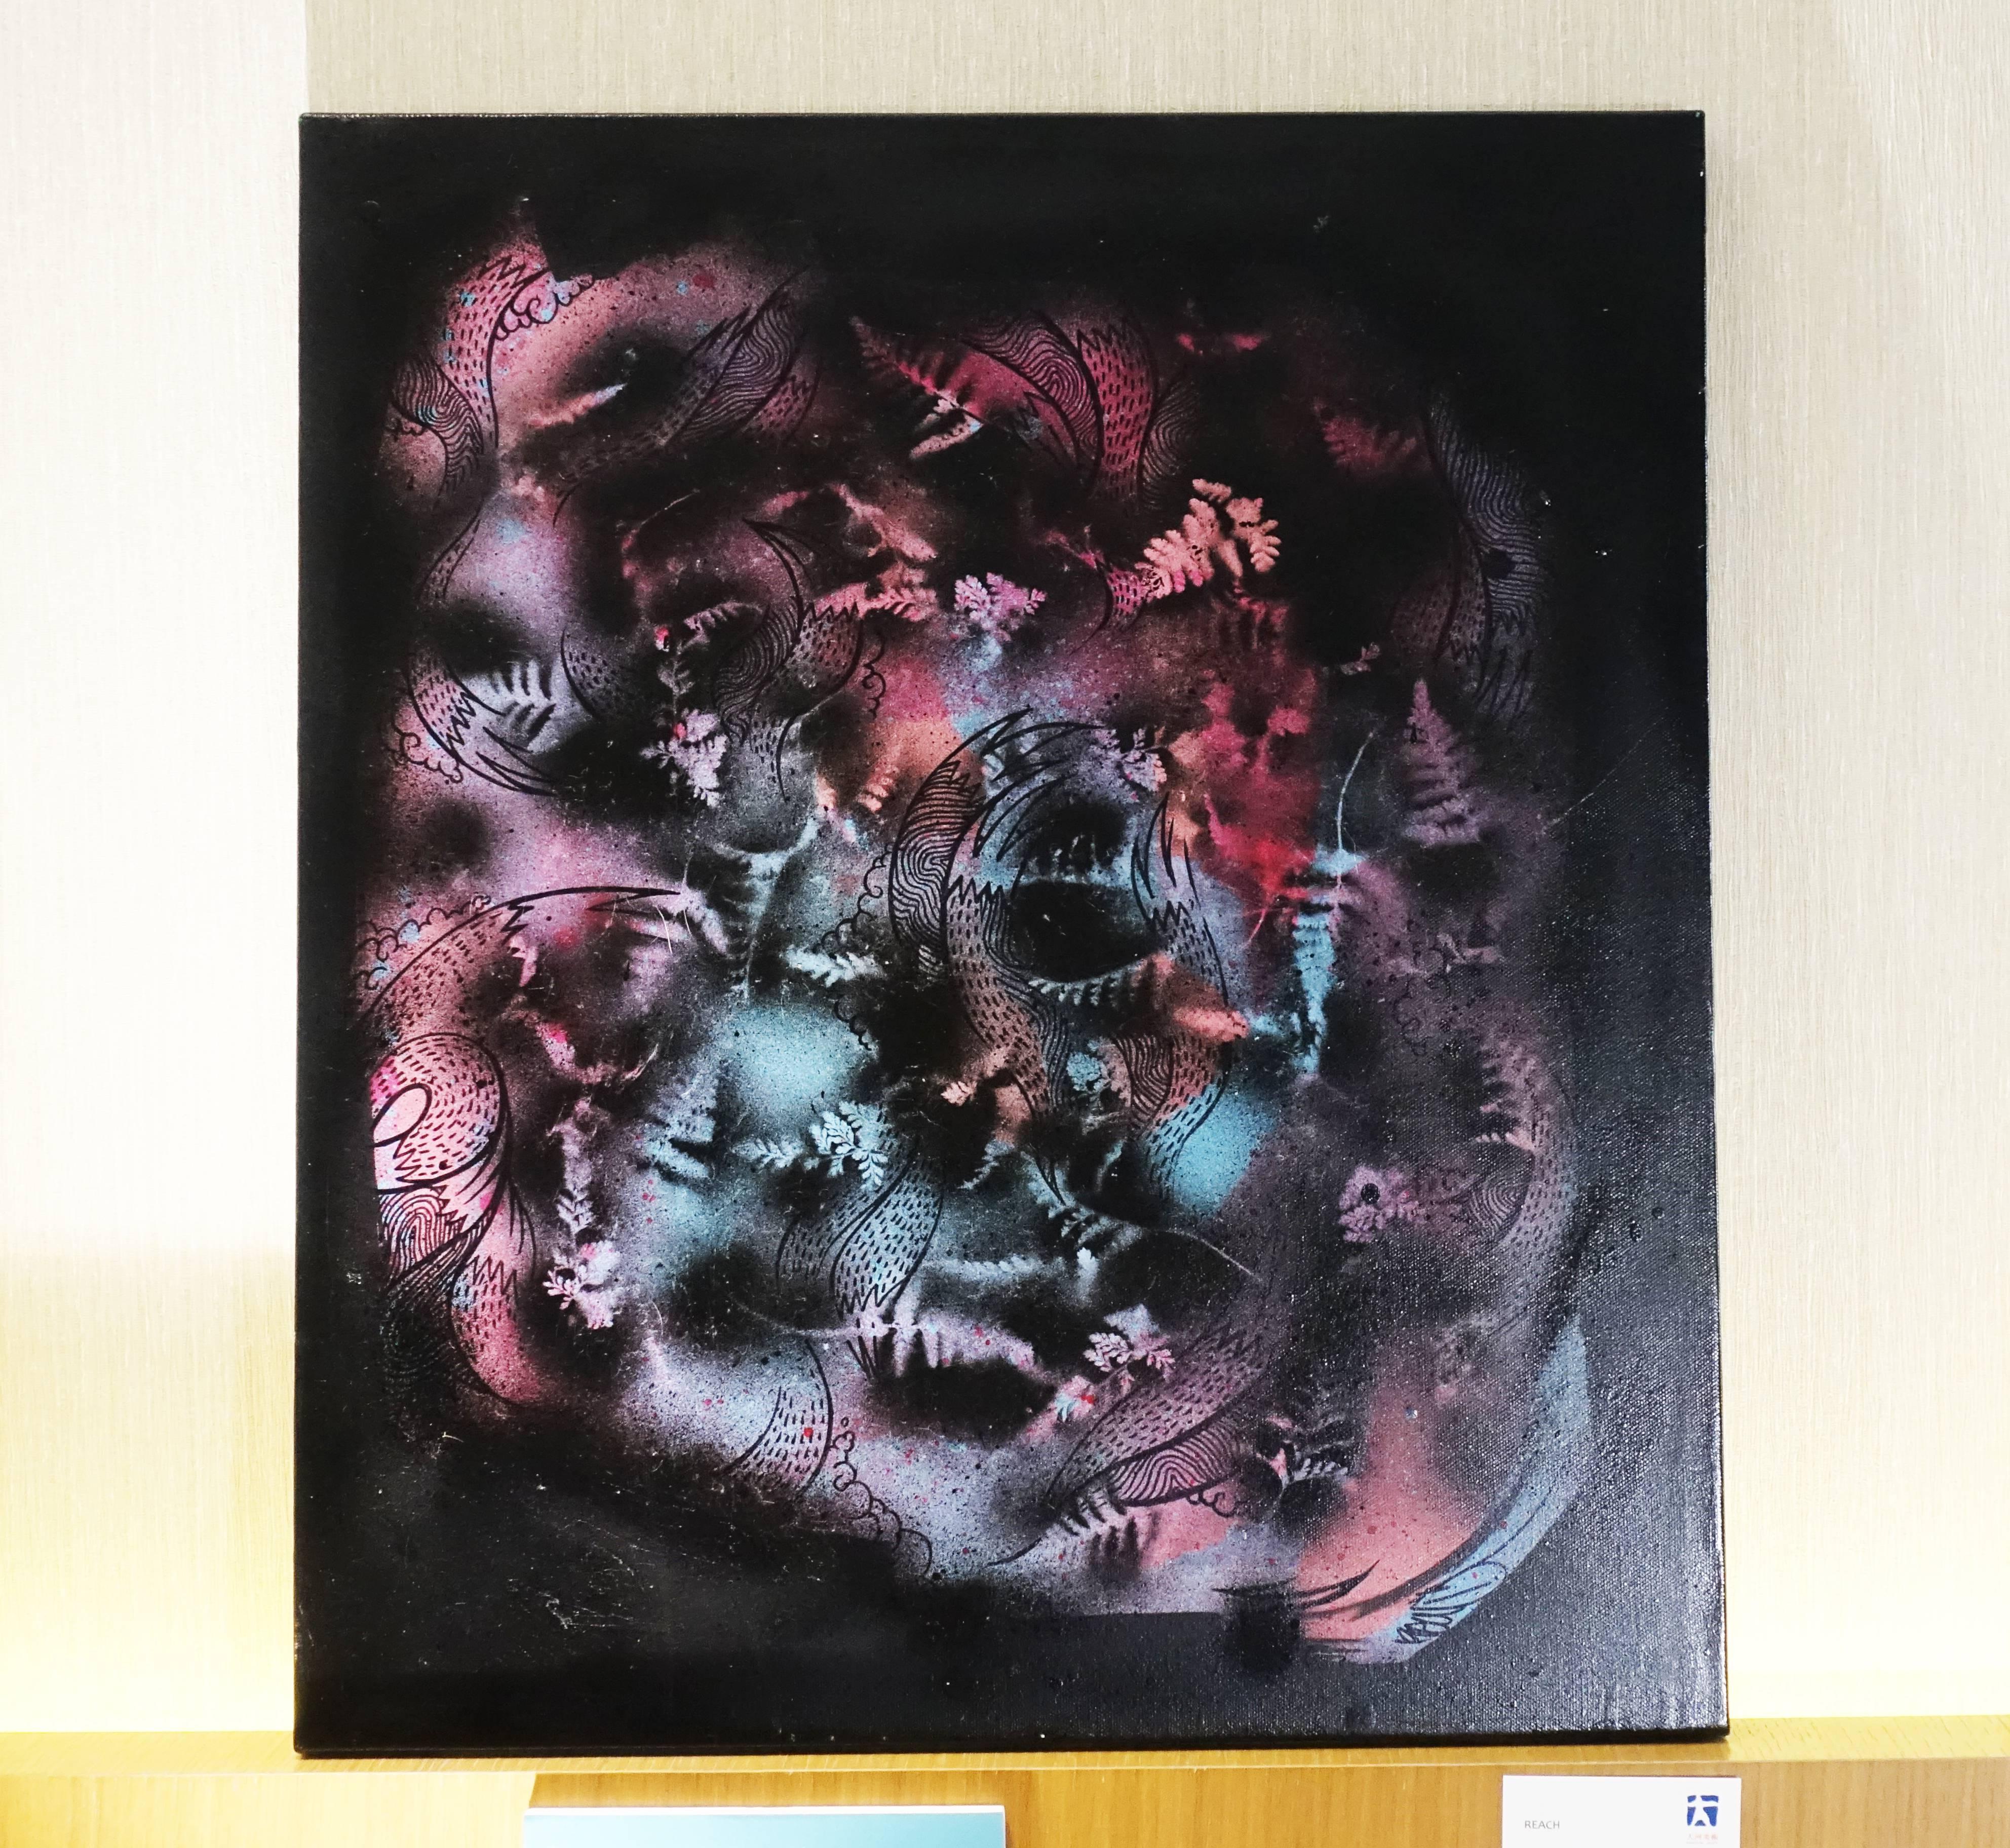 REACH,《STARS》,53 x 45 cm,壓克力、水性漆、噴漆於畫布,2008。